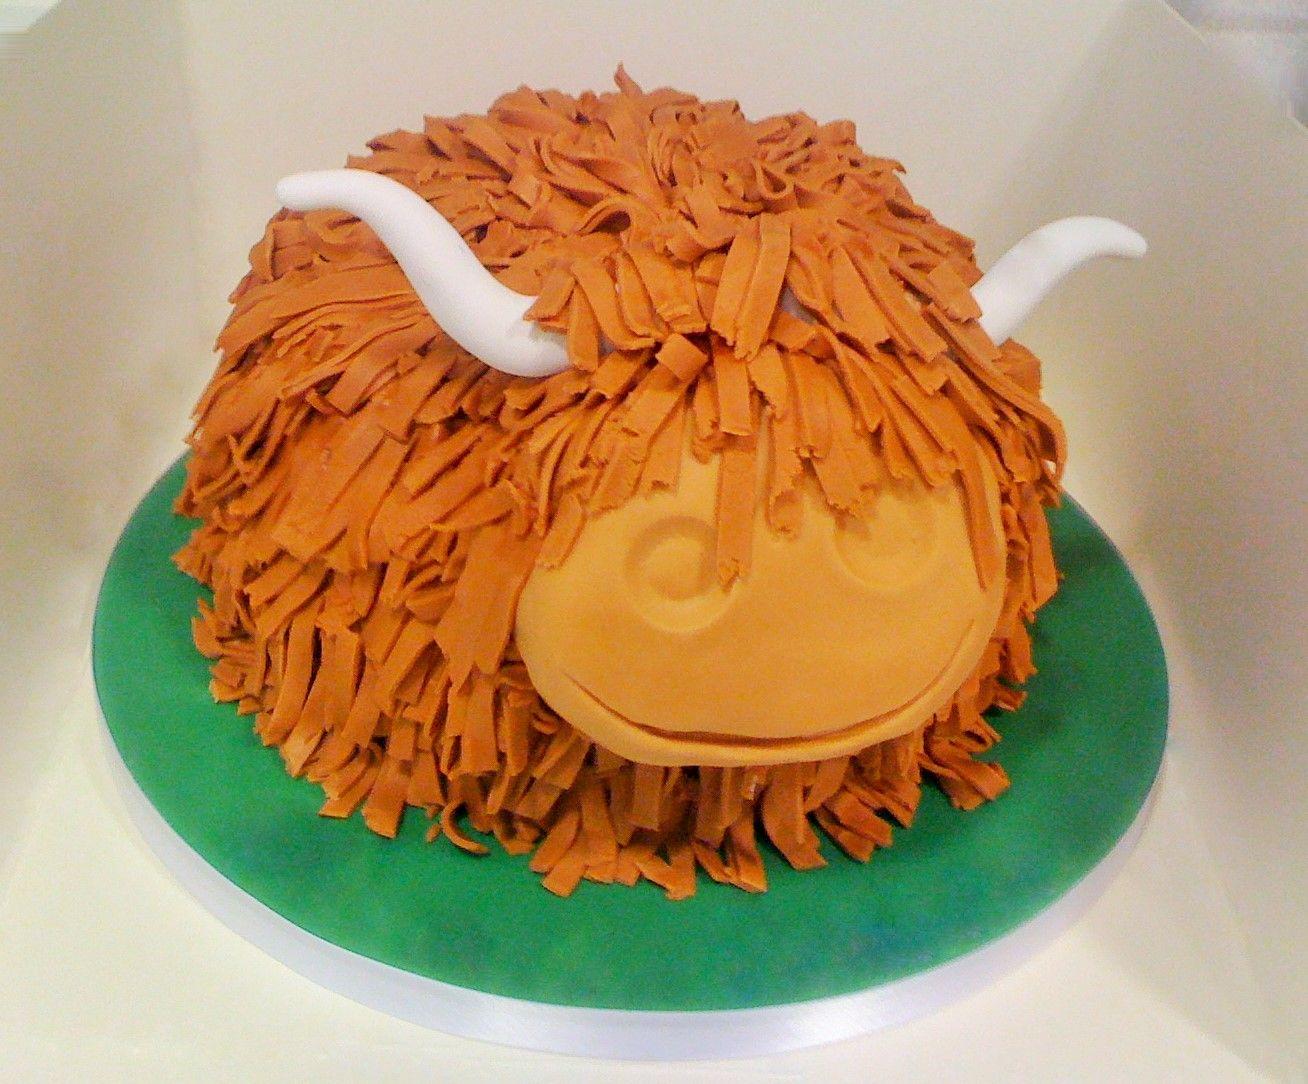 Highland cake recipe